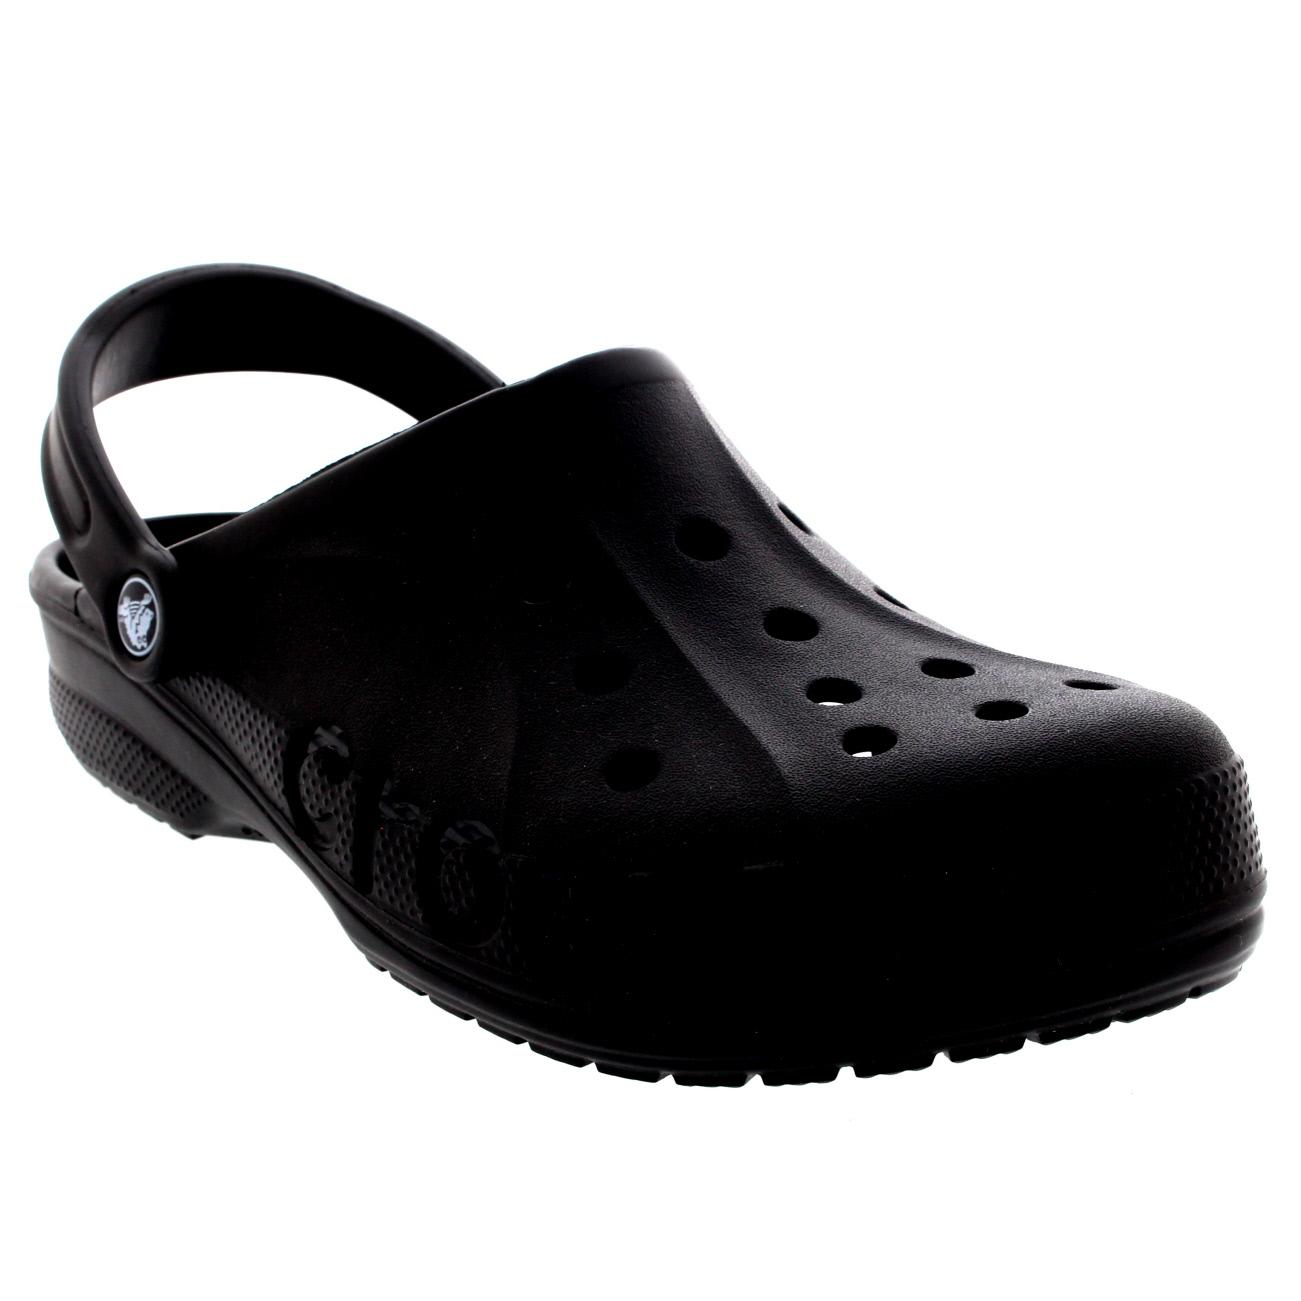 Unisex Adults Crocs Baya